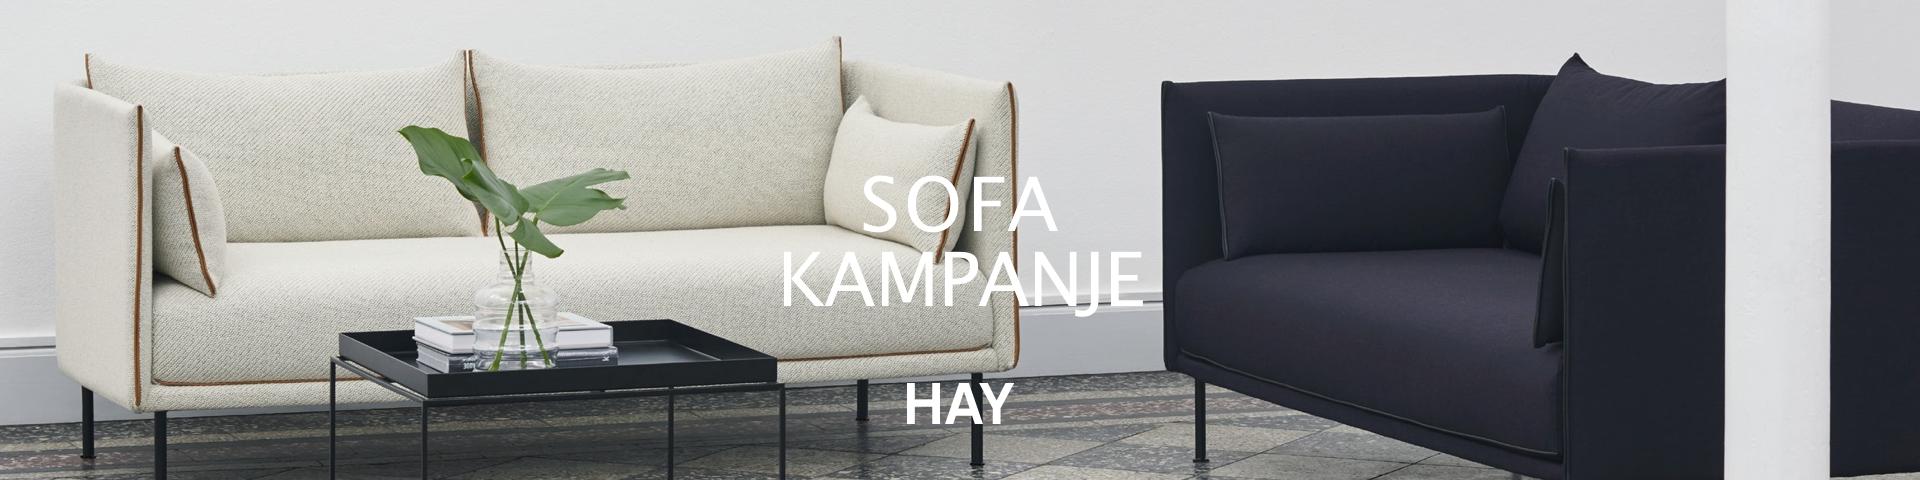 Sofa kampanje HAY